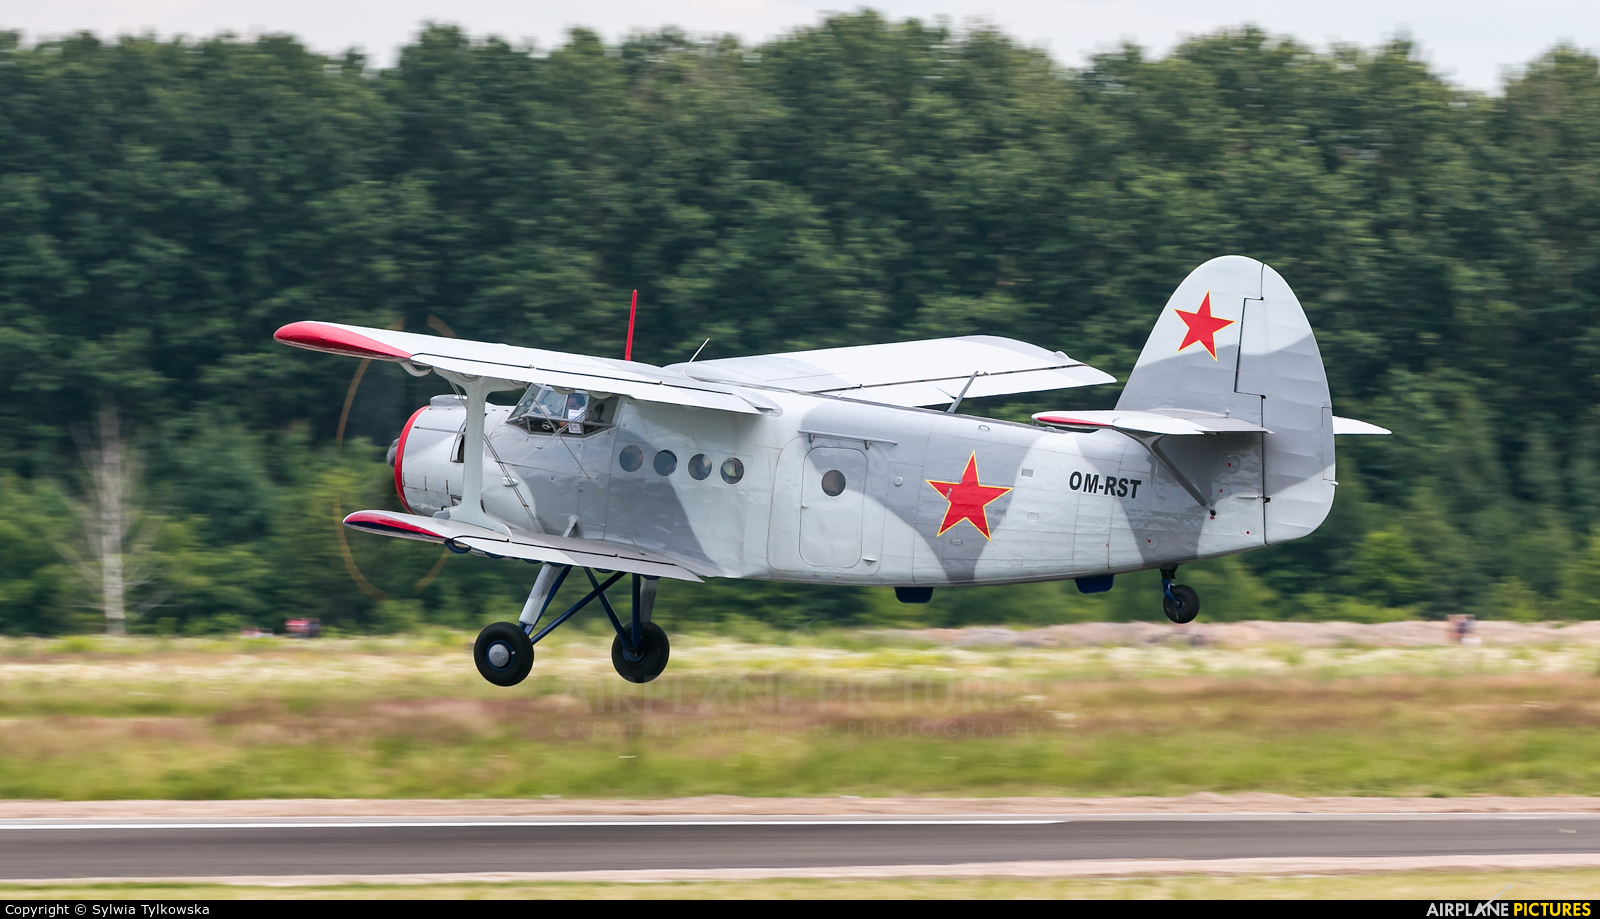 Aeroklub Kosice OM-RST aircraft at Katowice Muchowiec